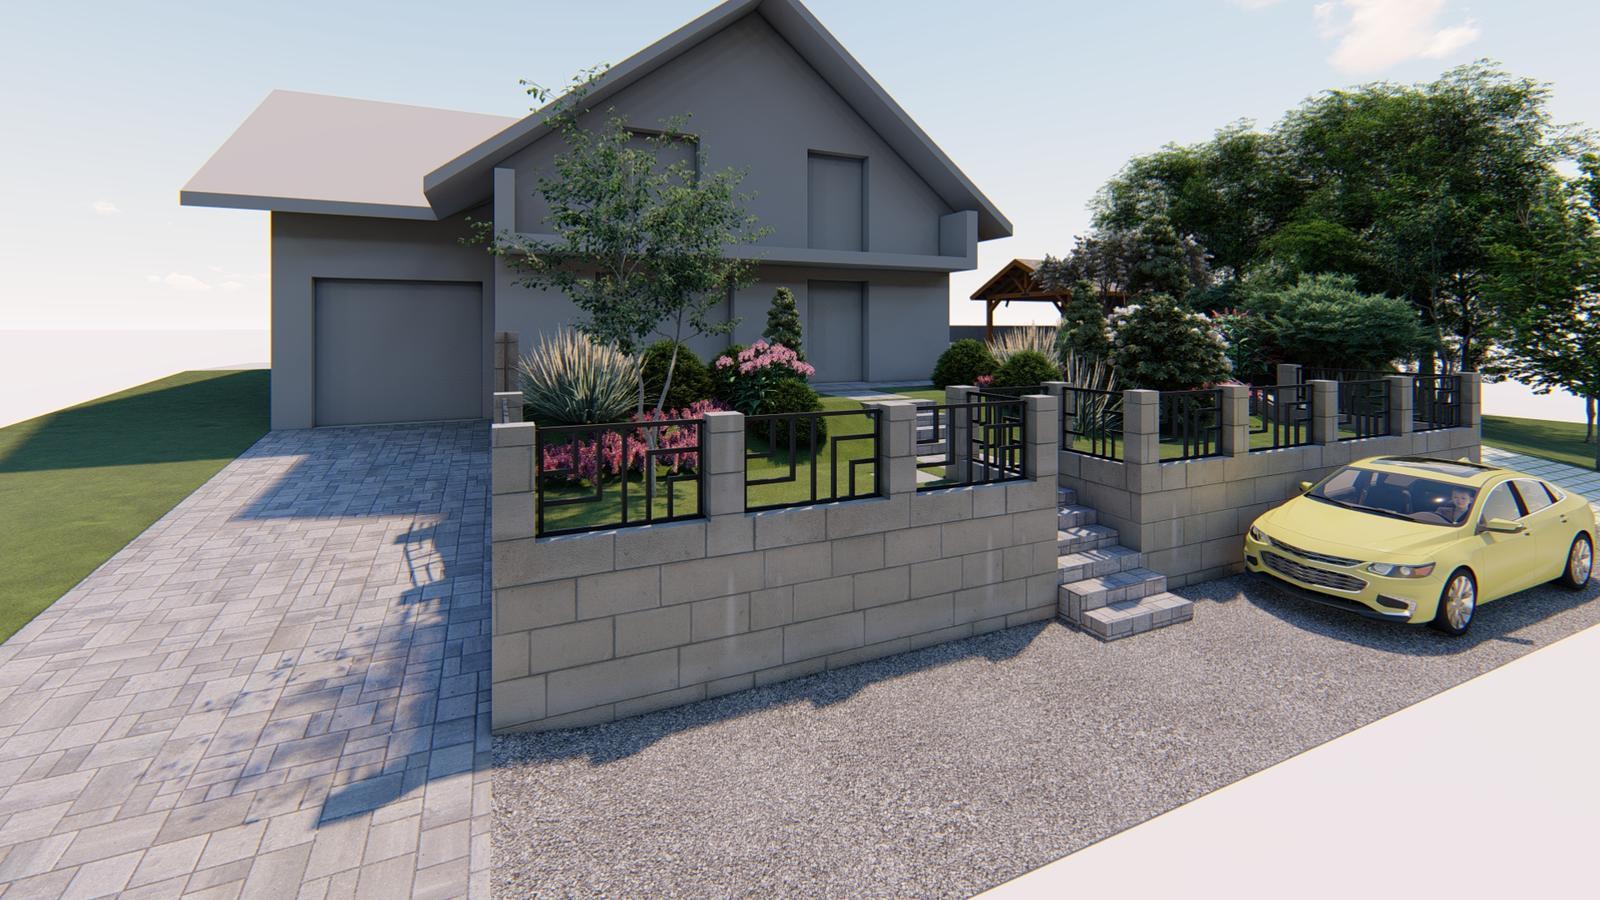 Návrh záhrady rodinného domu - Obrázok č. 10